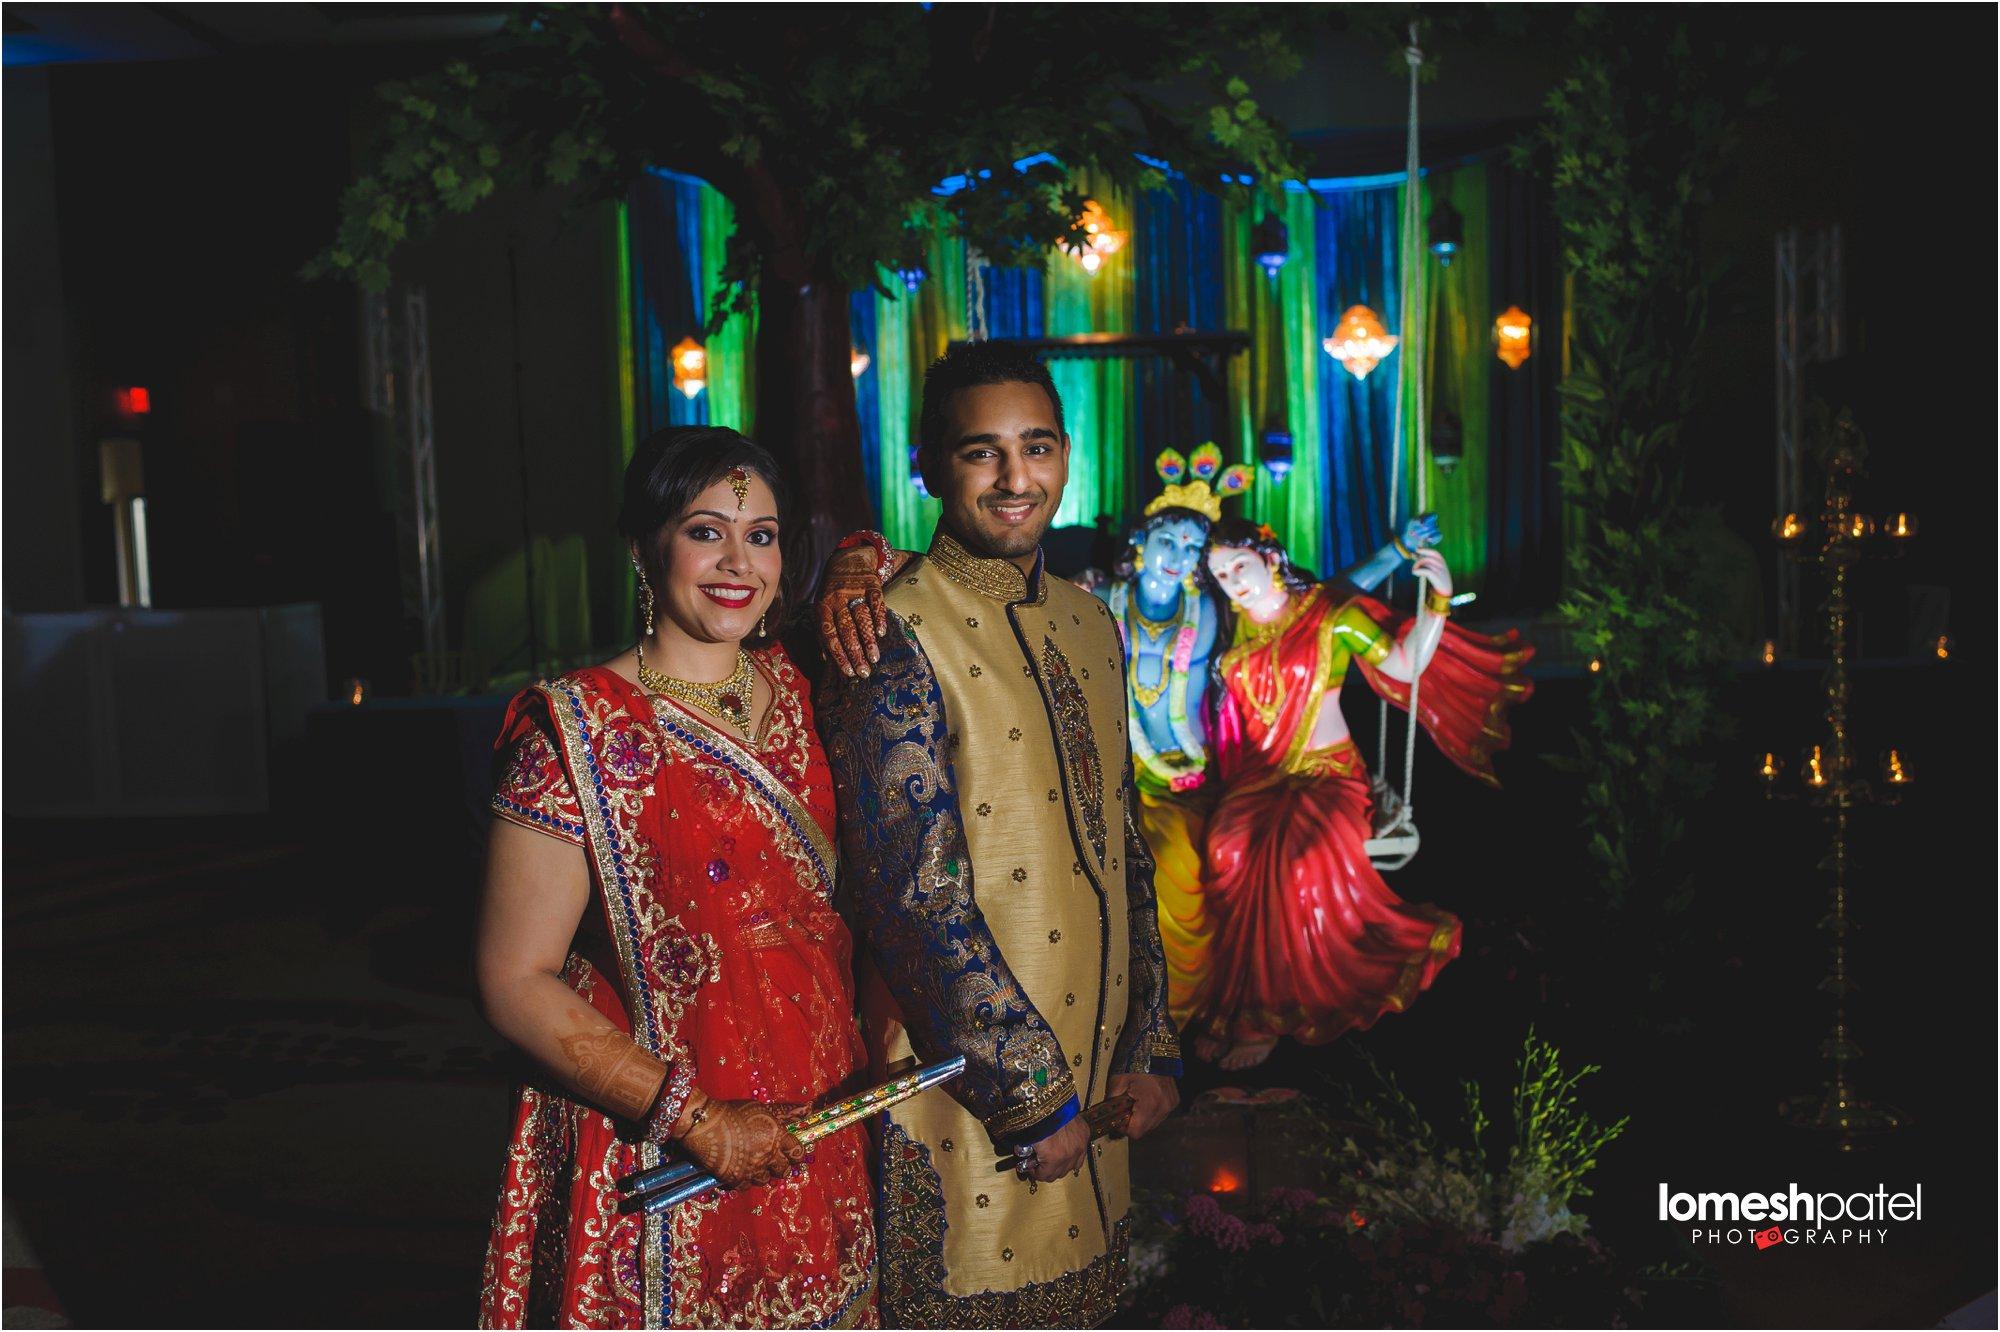 dallas_indian_wedding_0068.jpg